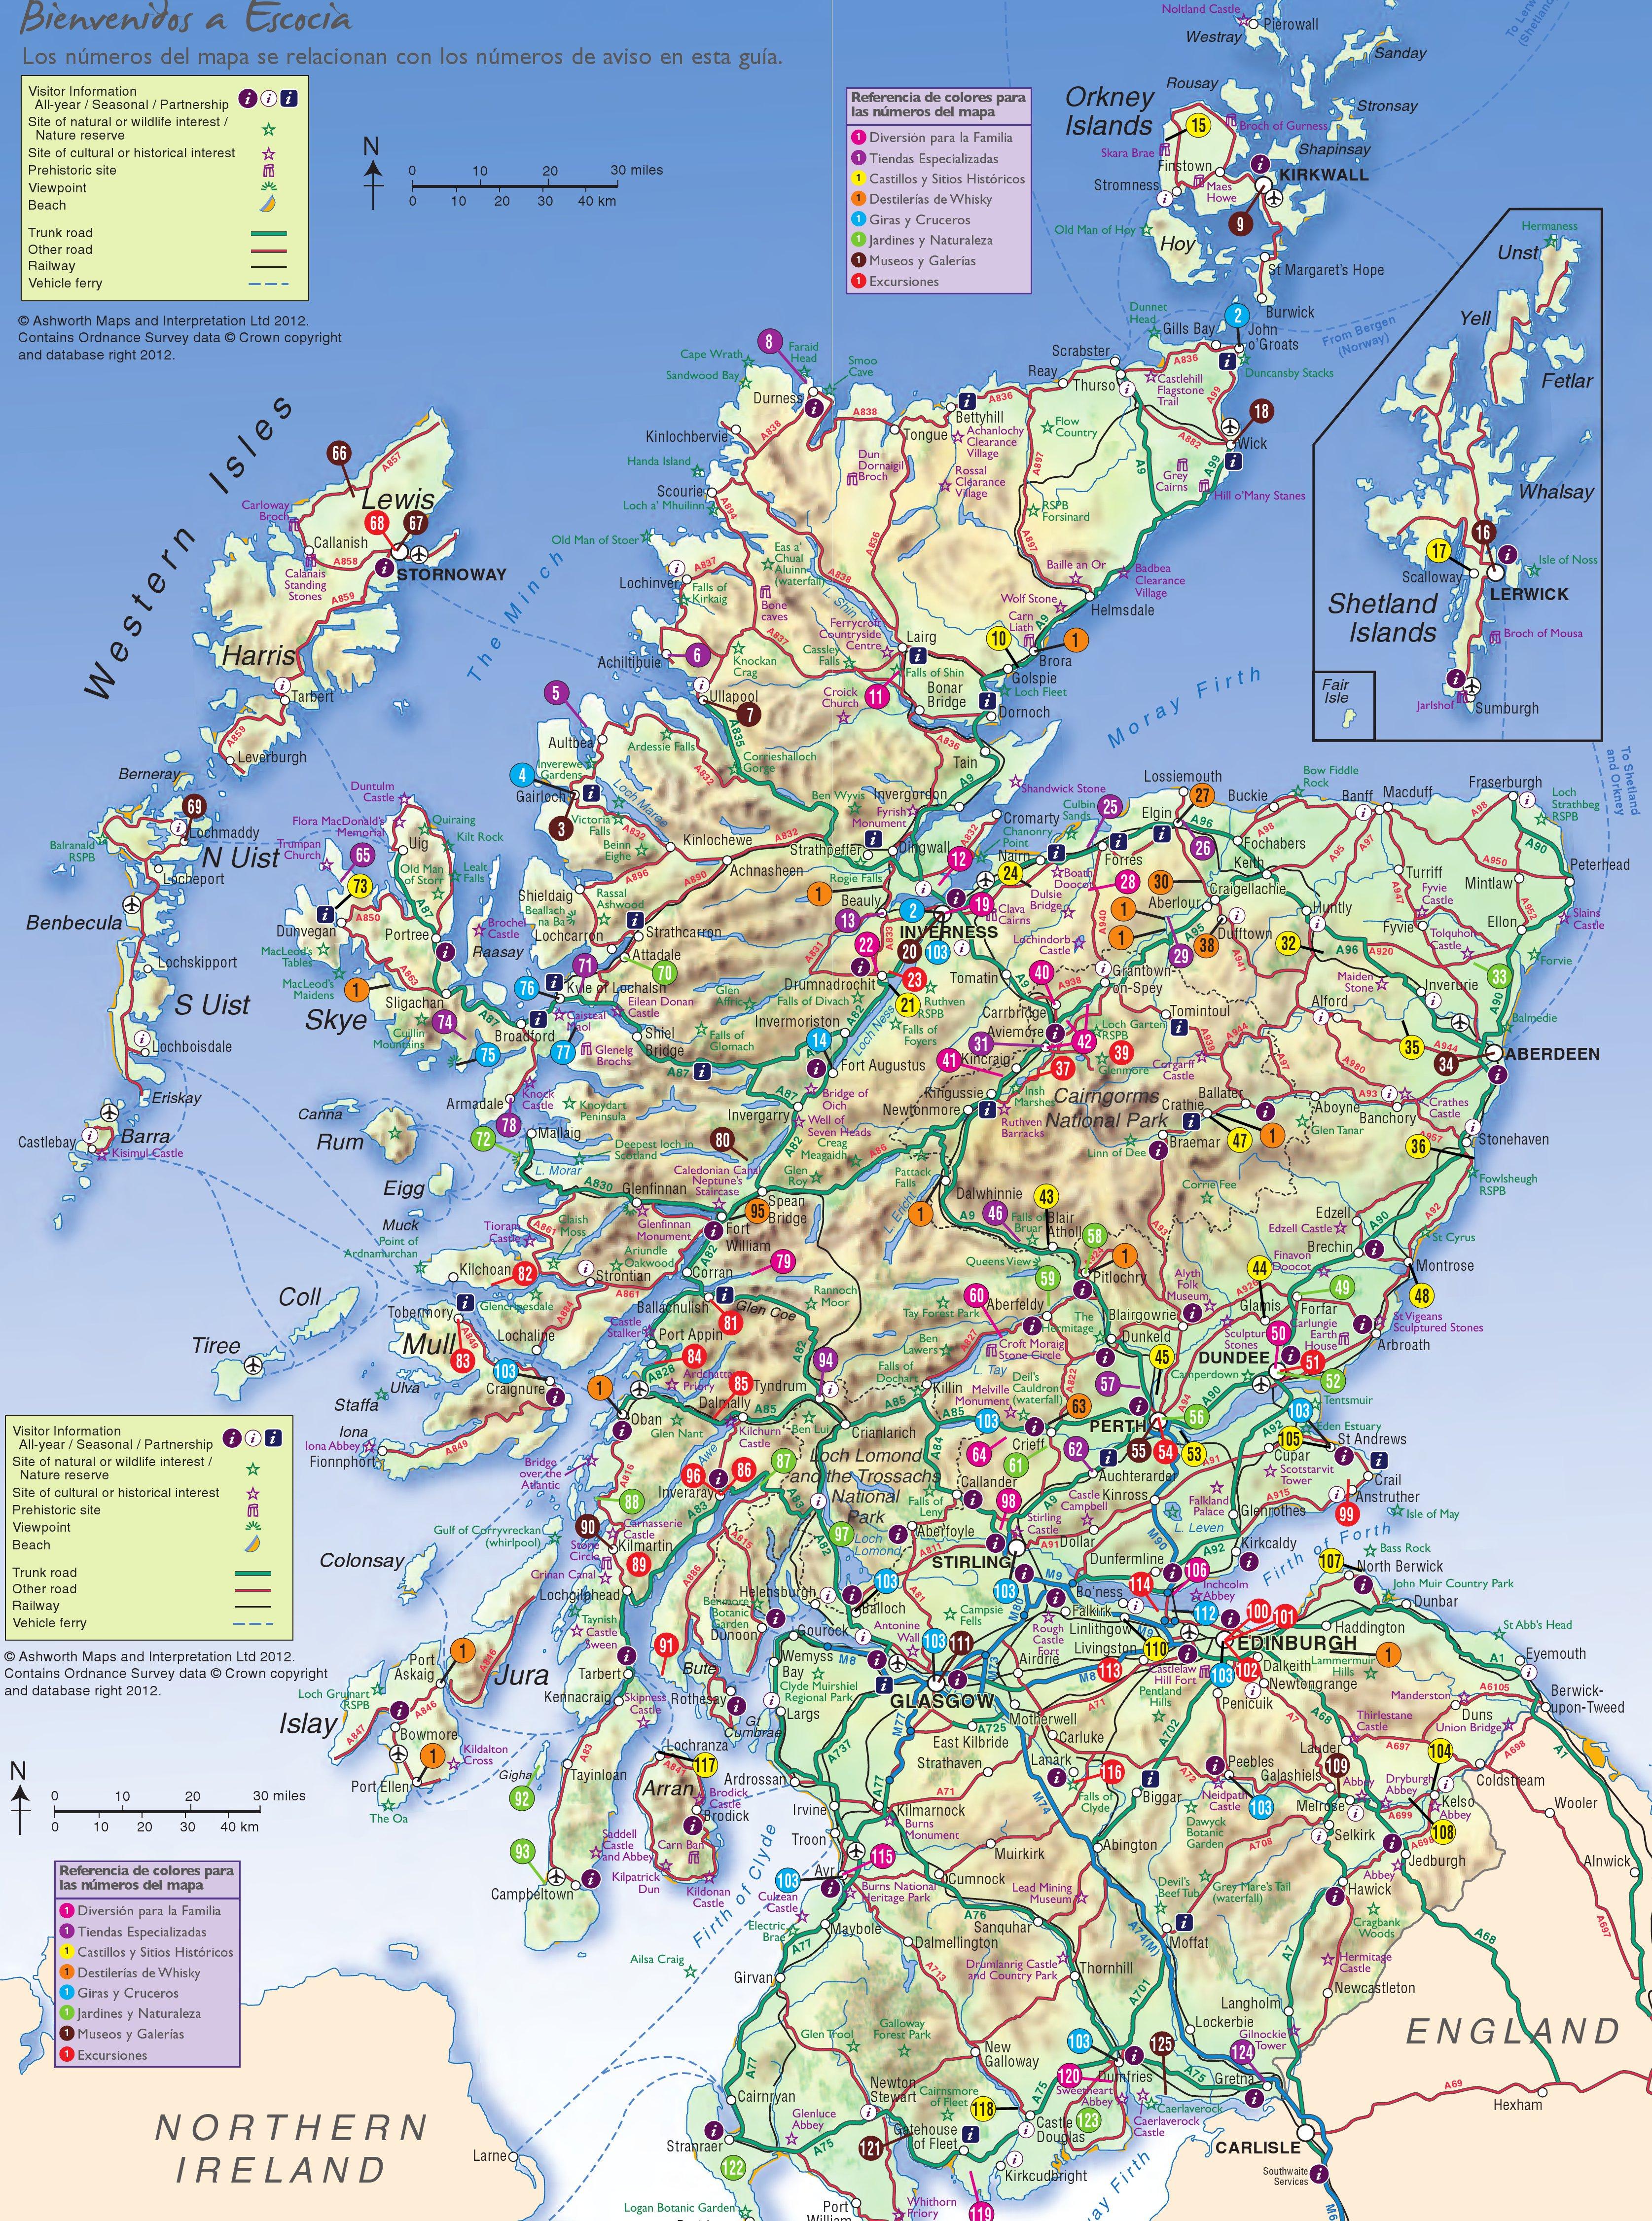 escocia mapa Consejos para viajar a Escocia   MAPA Y MOCHILA escocia mapa